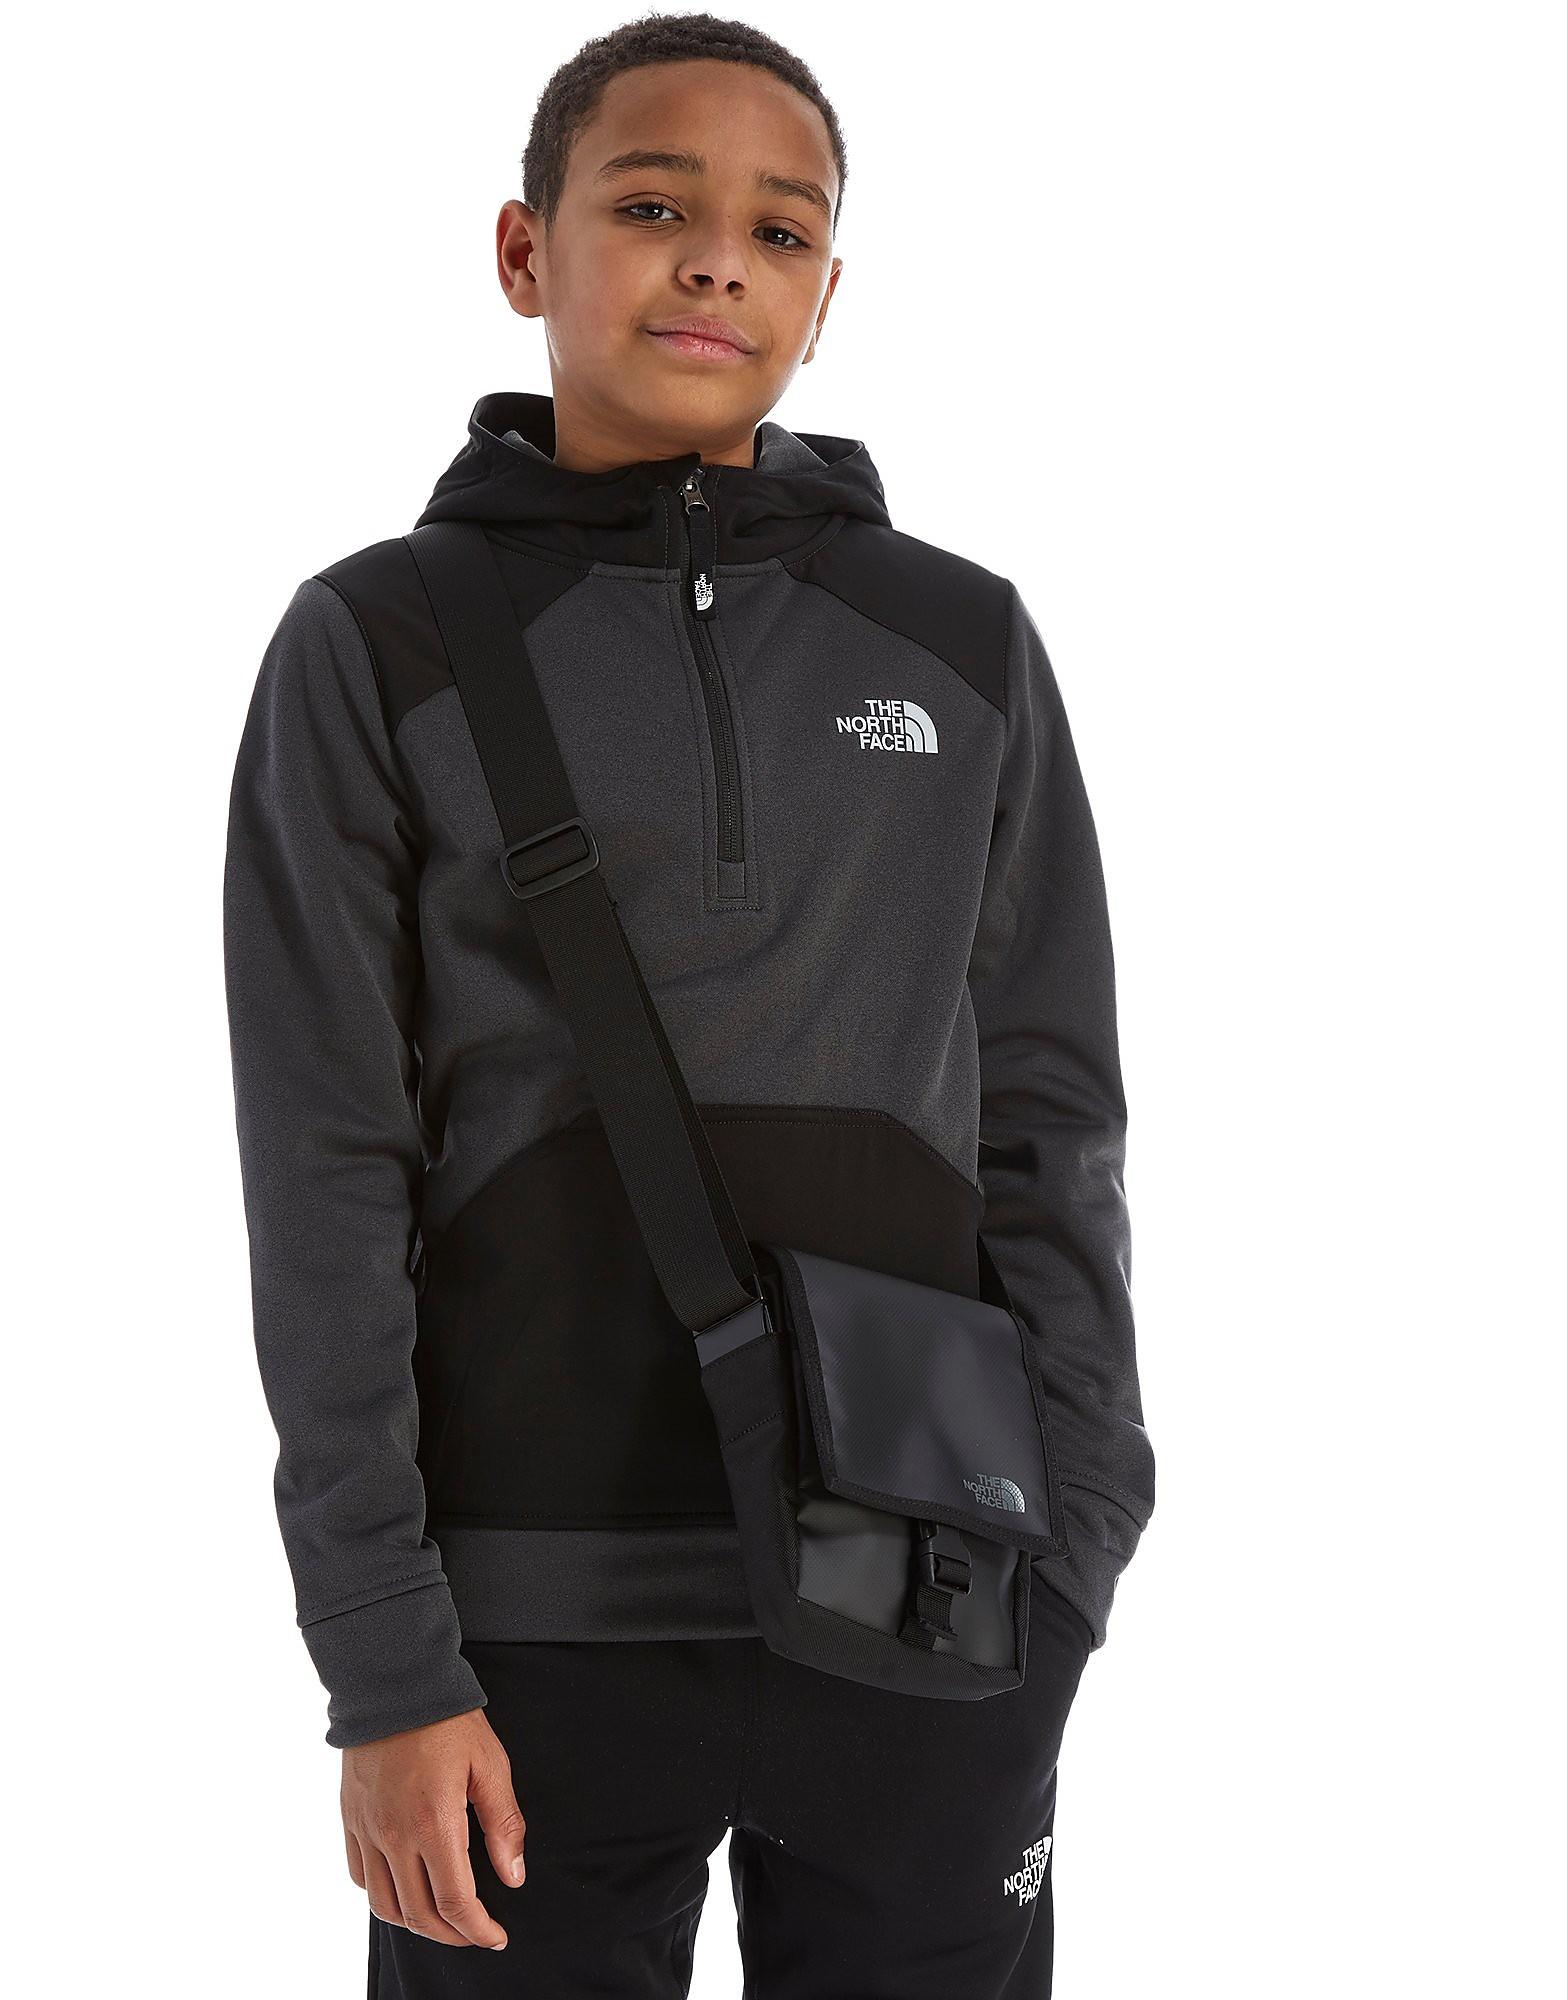 The North Face Mittellegi 1/2 Zip Hoodie Junior - Only at JD - Black, Black